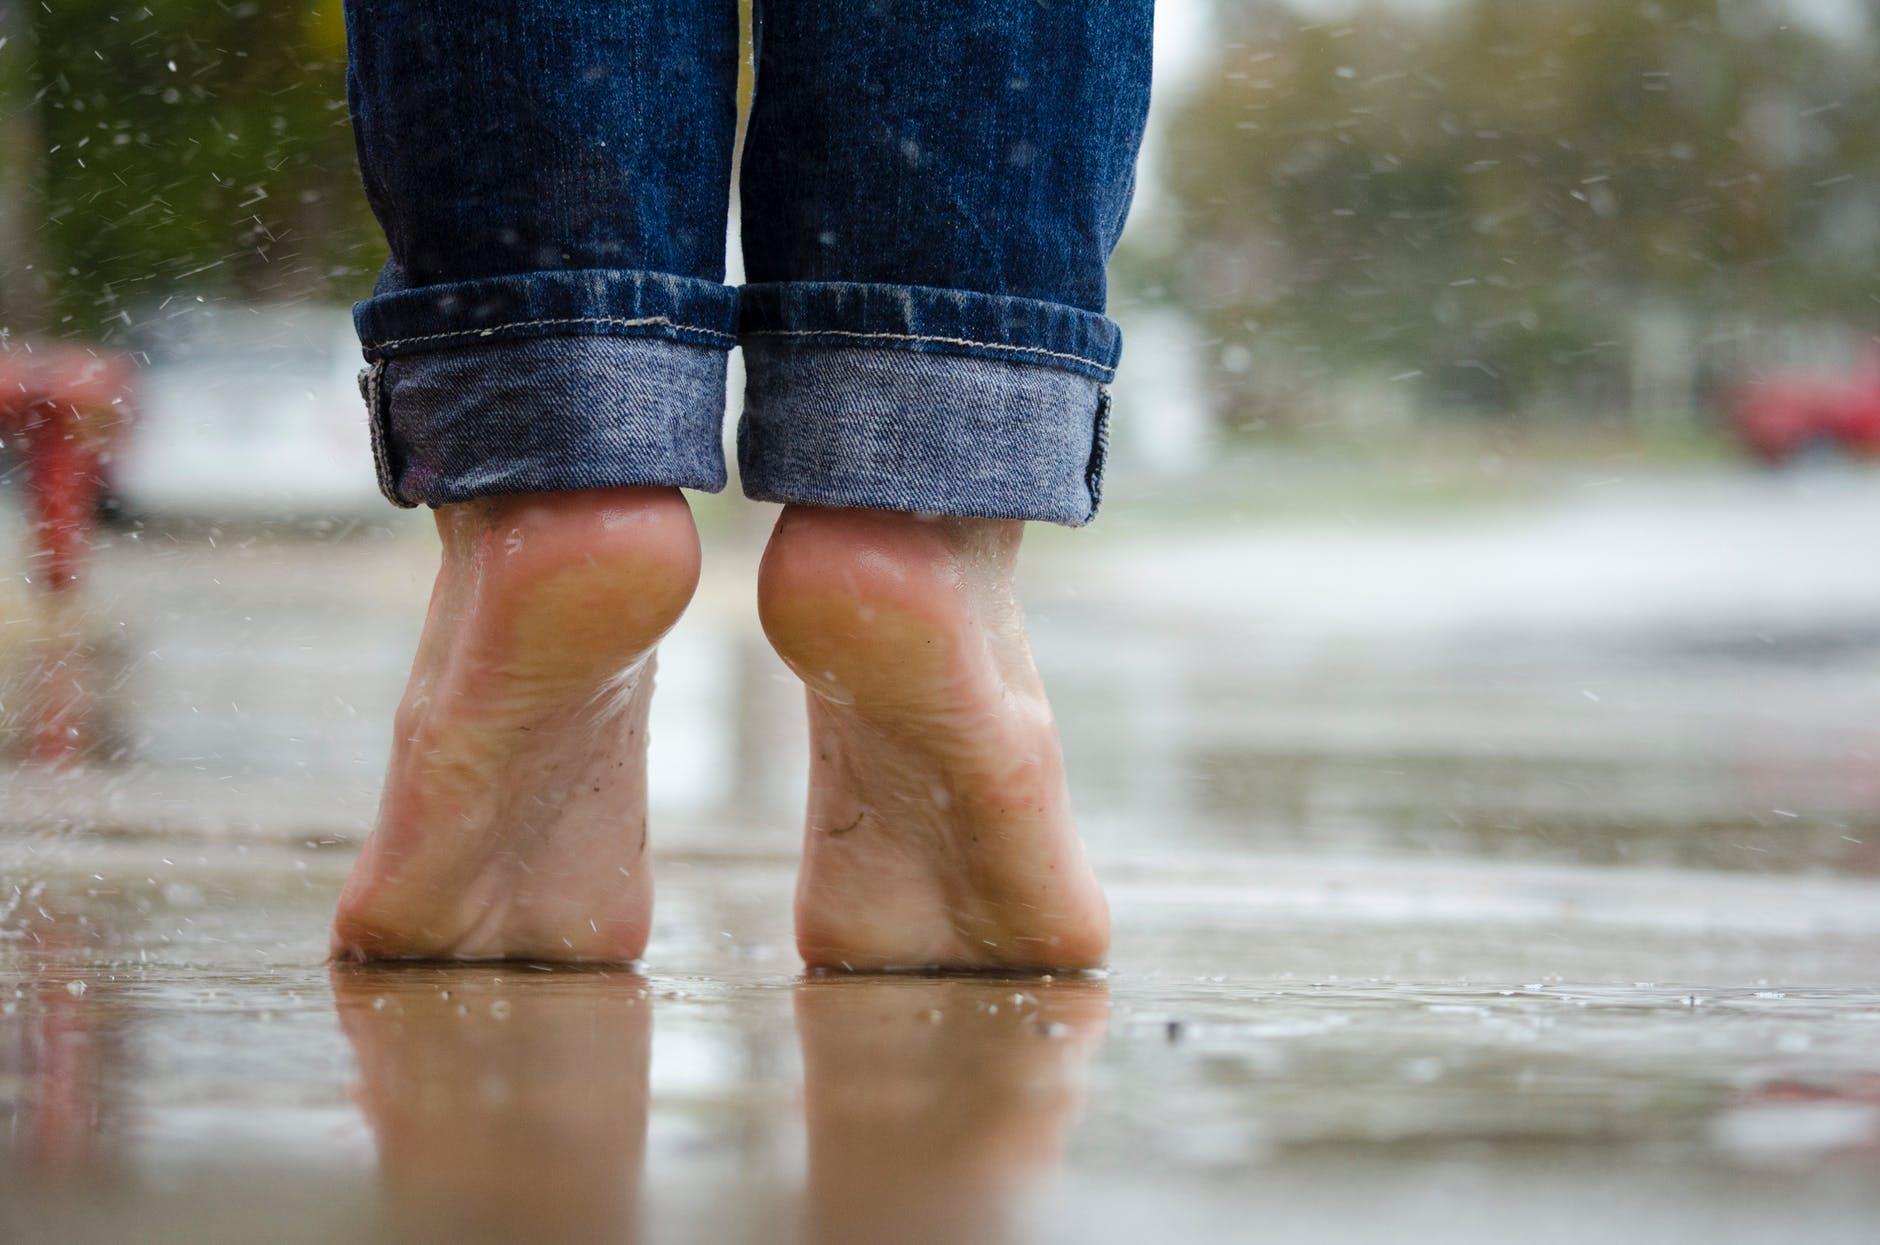 Feet and Low back pain|Feet-and-Low-back-pain